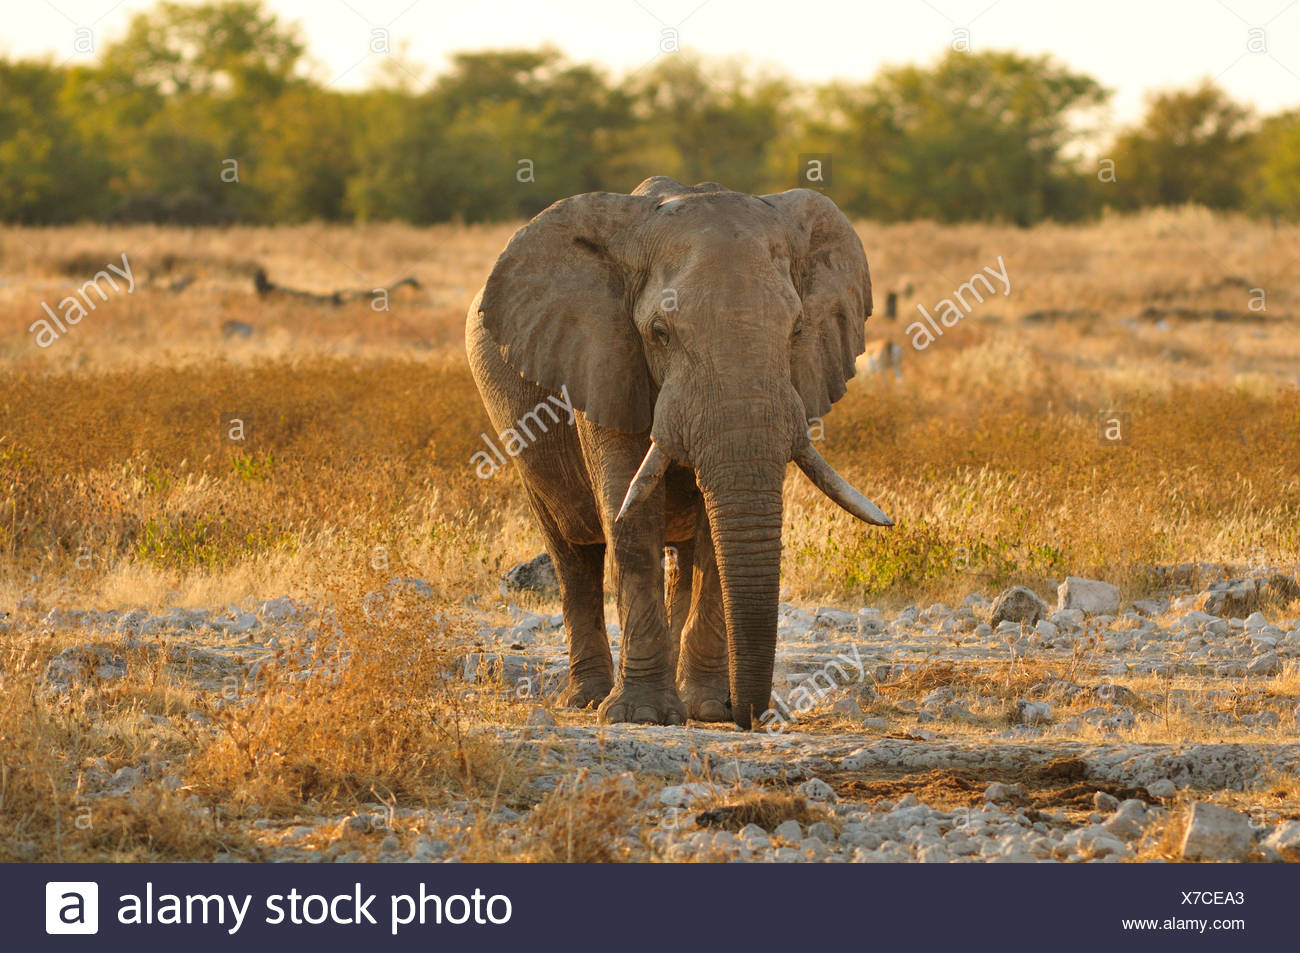 Afrika, Etosha Nationalpark, Namibia, Afrika, Tier, Sonnenuntergang, Elefant, Tier, Horizontal, Landschaft, Ebenen, Safari, Savanne Stockbild